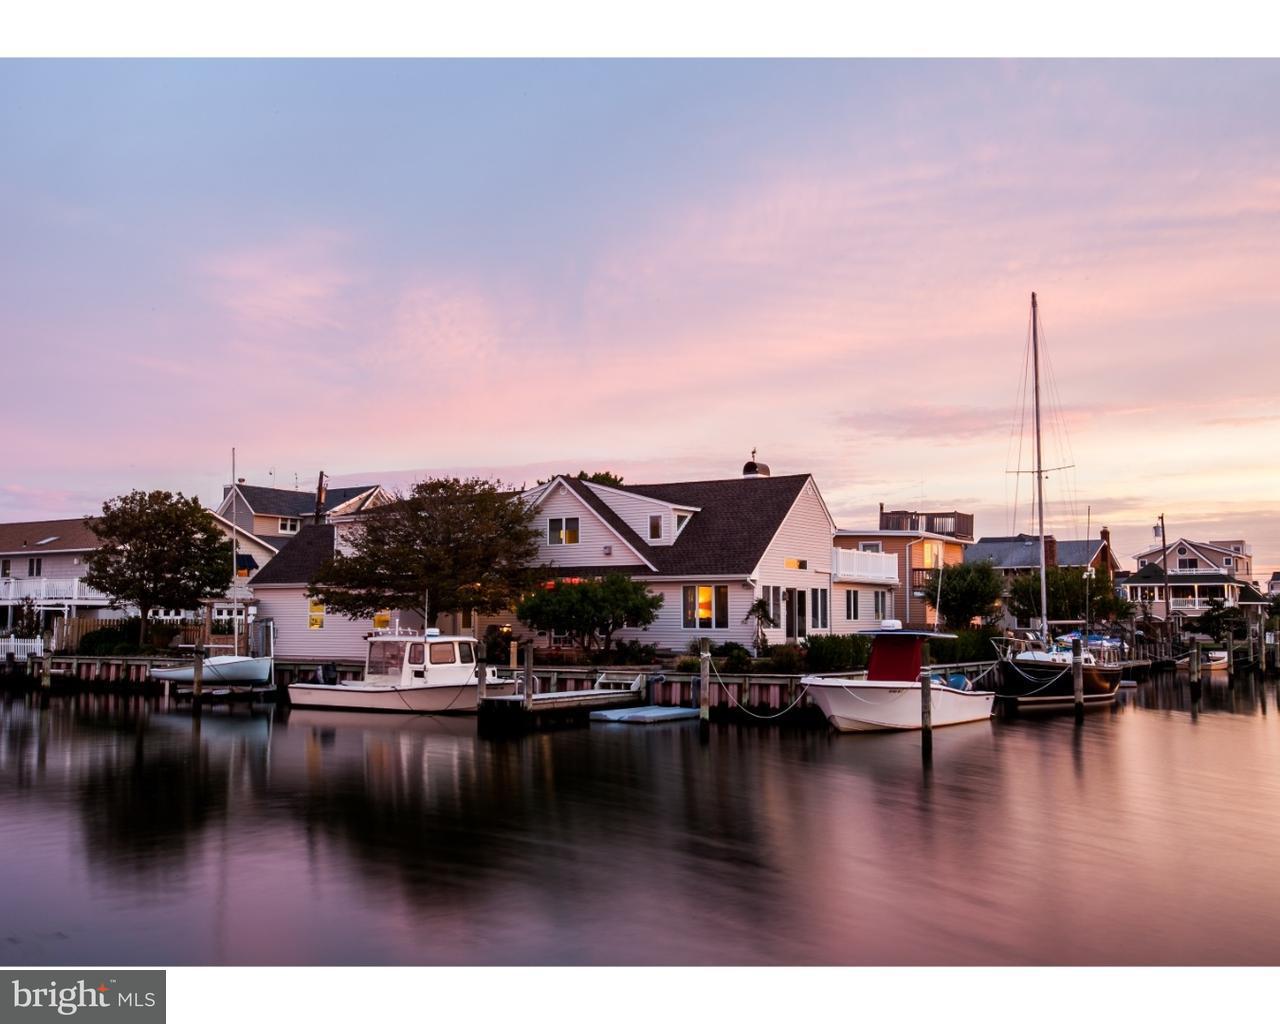 Moradia para Venda às 314 COVE Lane Beach Haven, Nova Jersey 08008 Estados Unidos